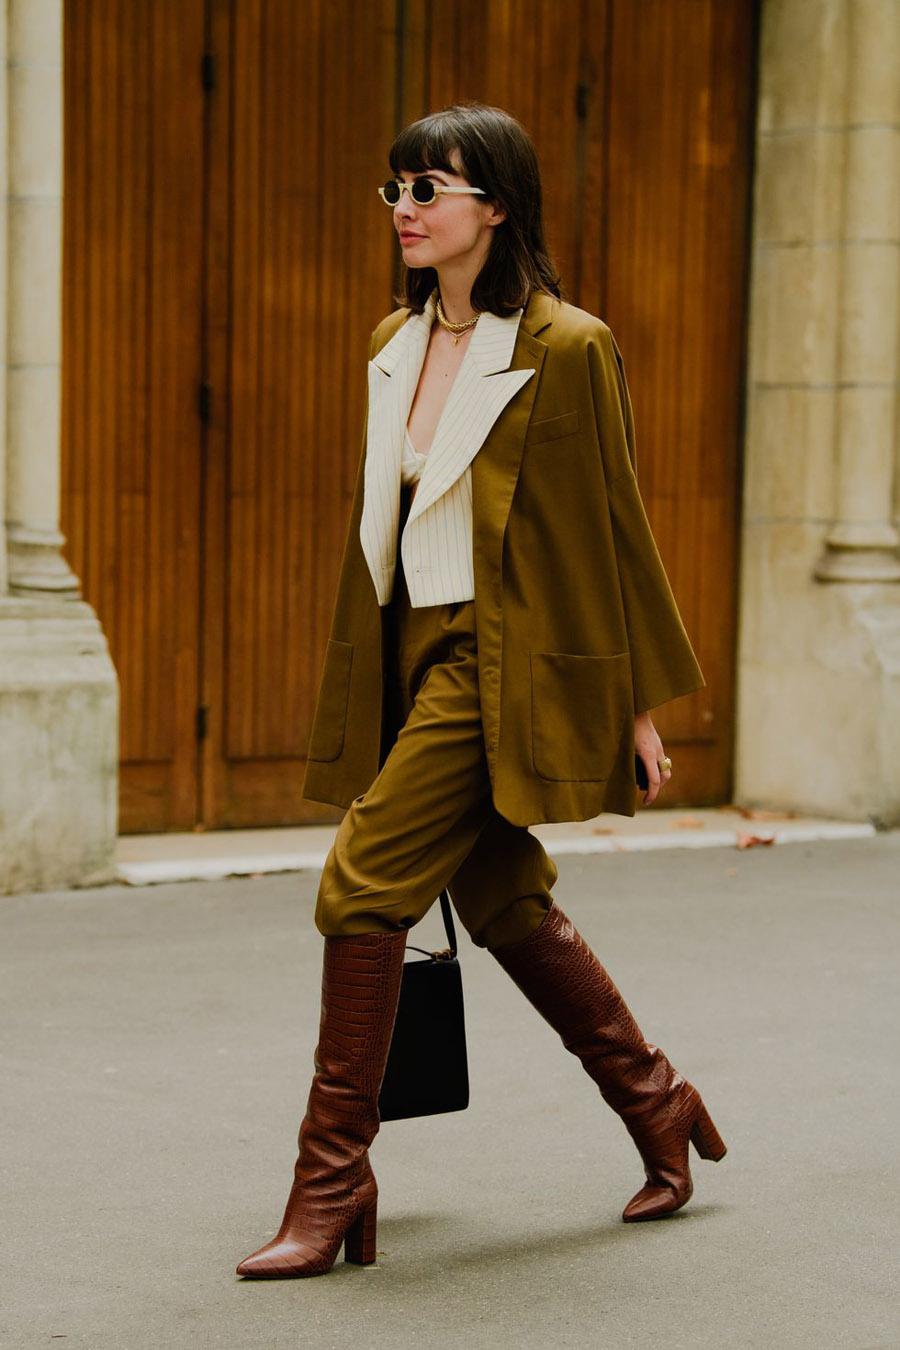 paris-fashion-week-pfw-street-style-ss20-day-5-by-tyler-joe-108-1569835072